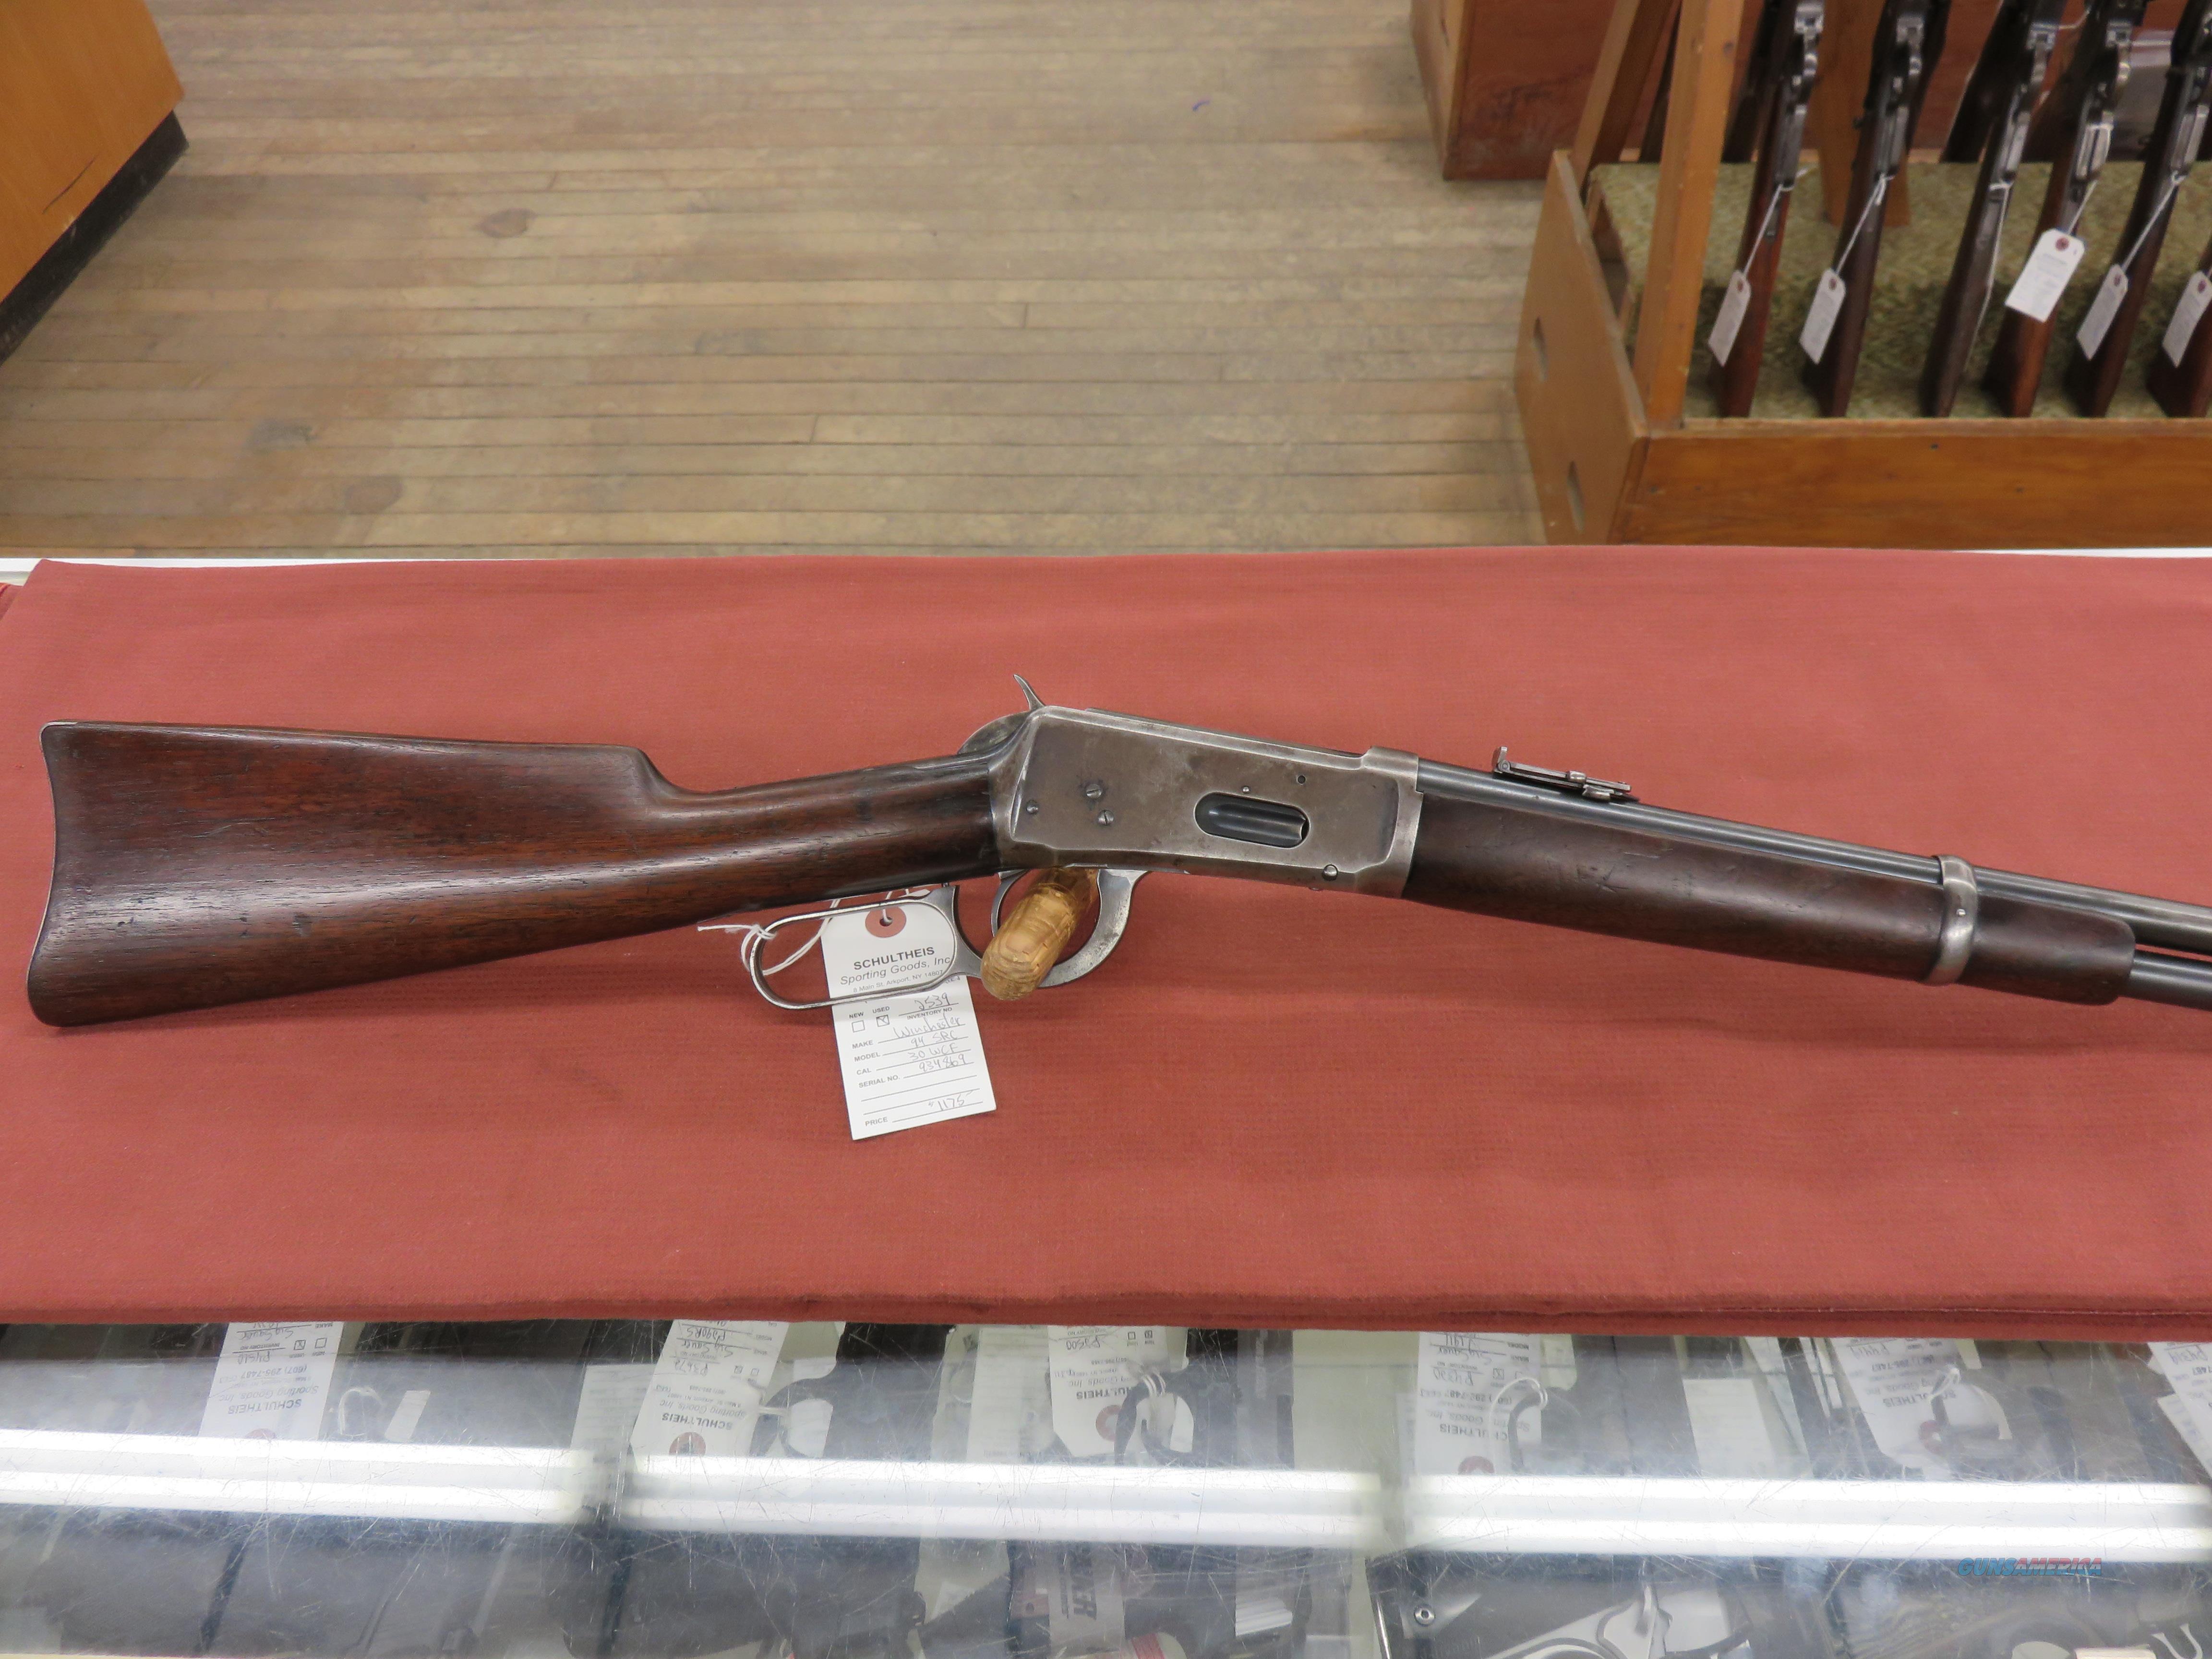 Winchester 94 Saddle Ring Carbine  Guns > Rifles > Winchester Rifles - Modern Lever > Model 94 > Pre-64